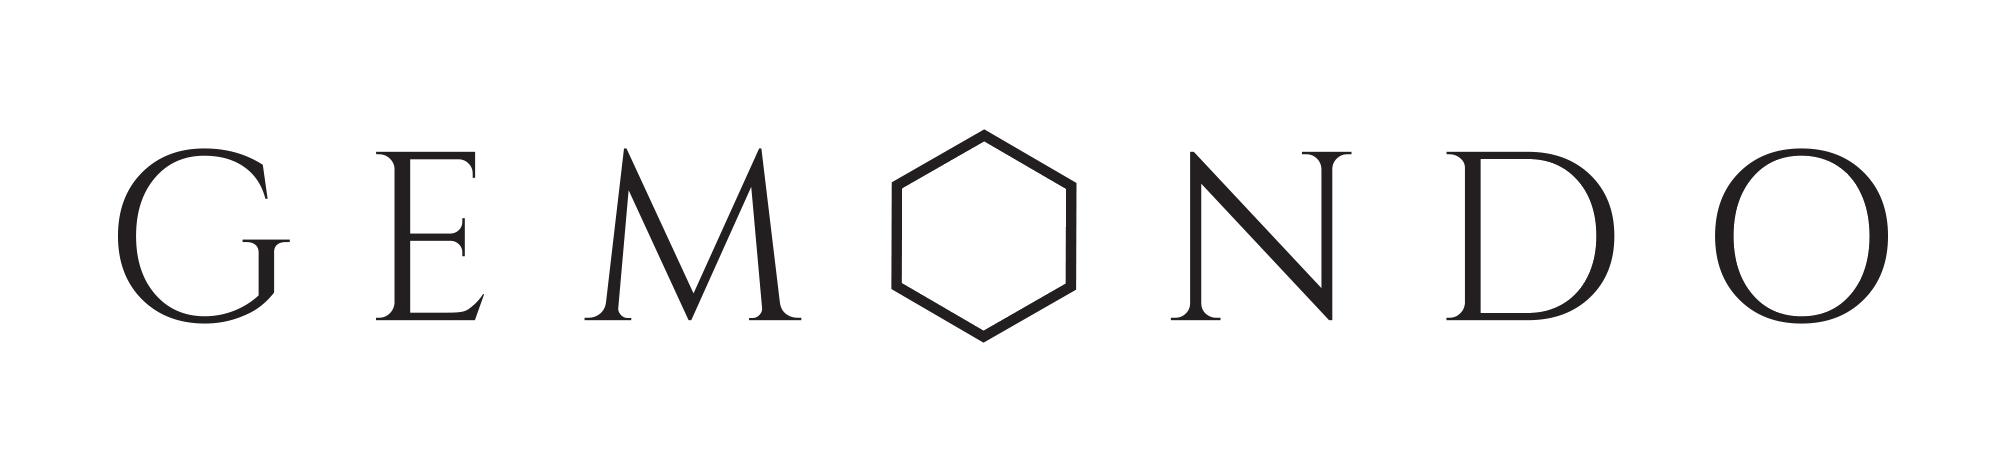 Gemondo jewellery logo